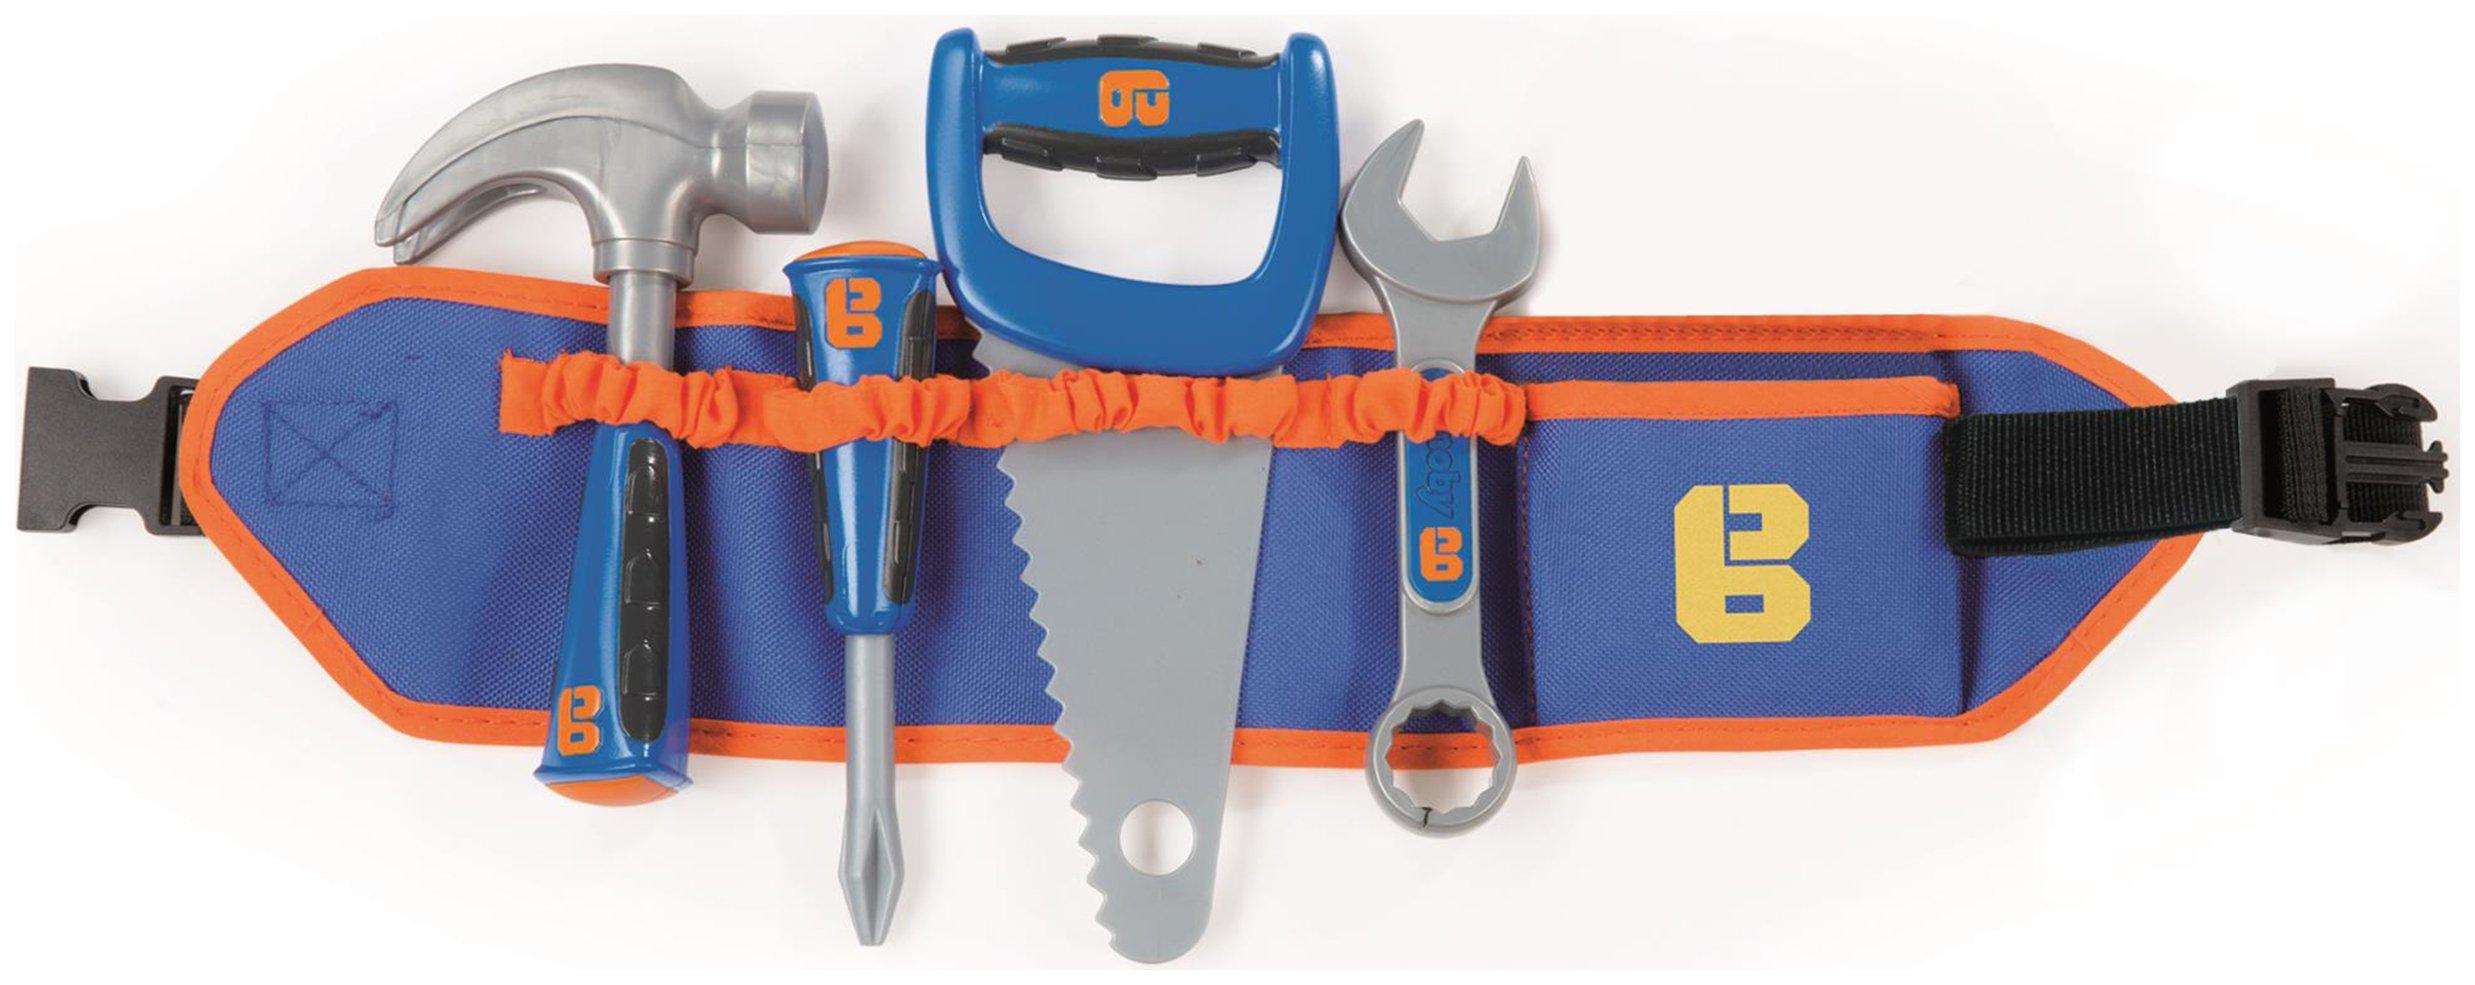 Image of Bob the Builder Tool Belt